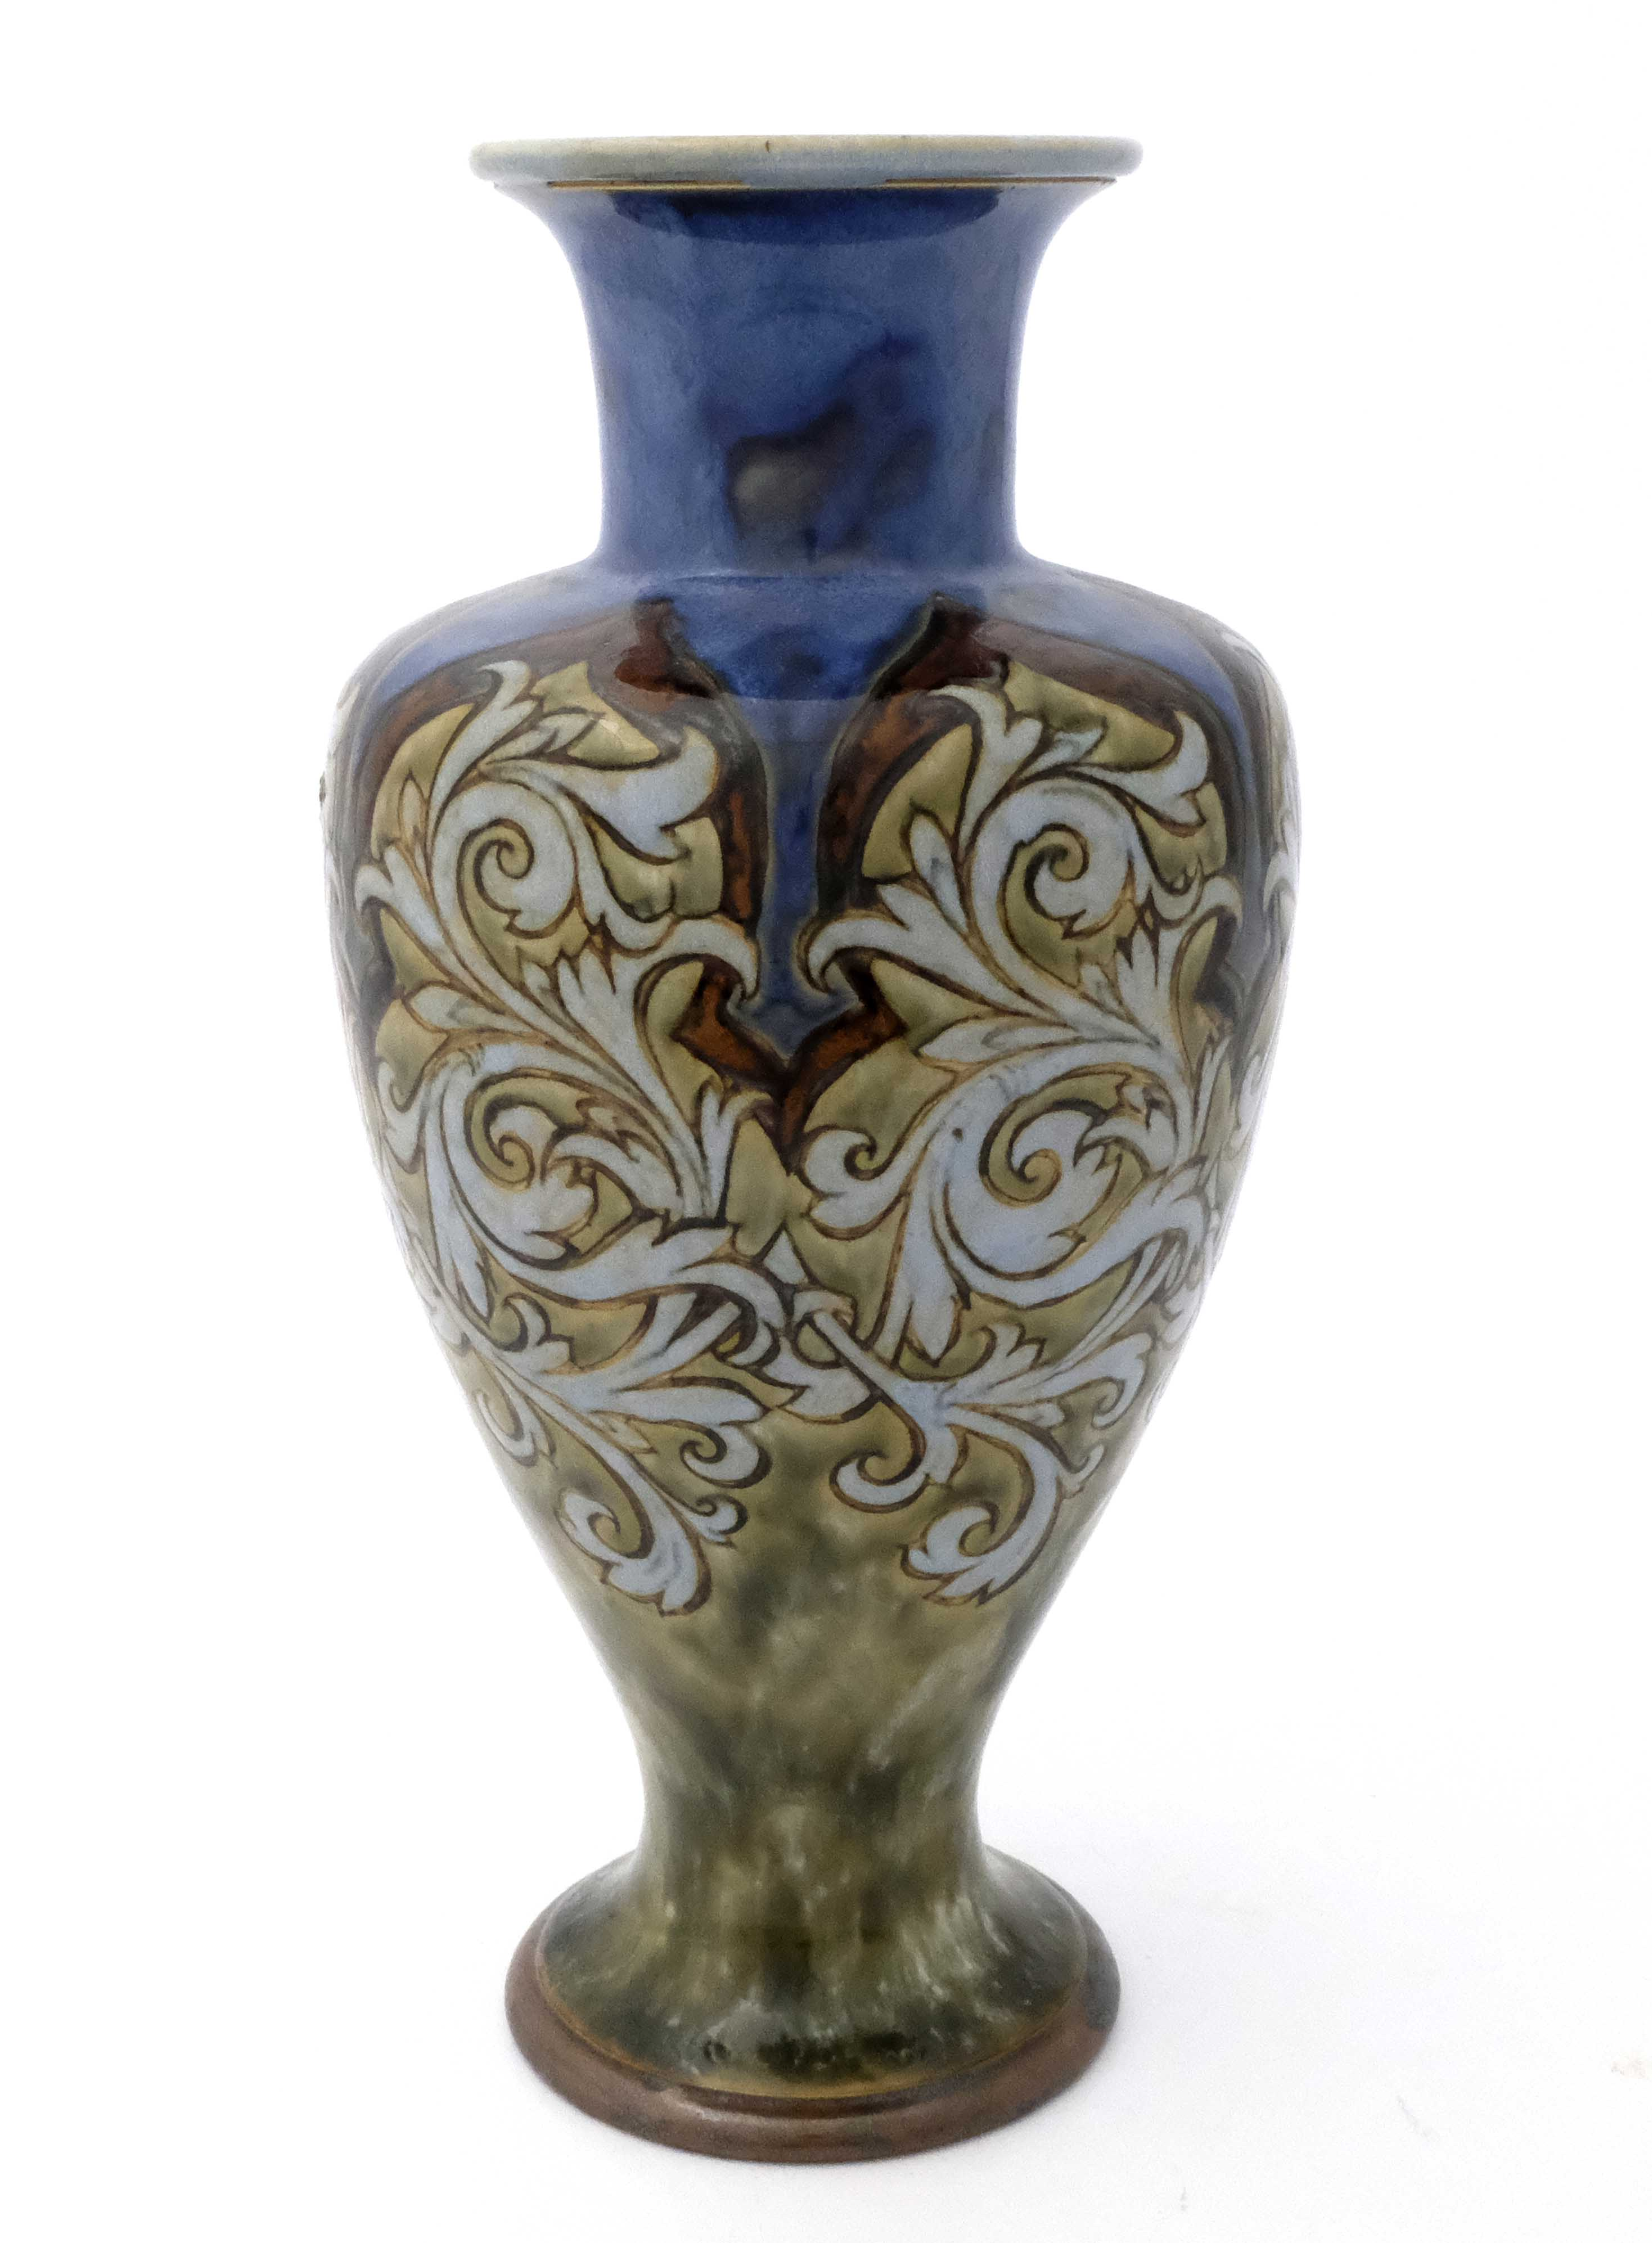 Eliza Simmance for Royal Doulton, a stoneware vase